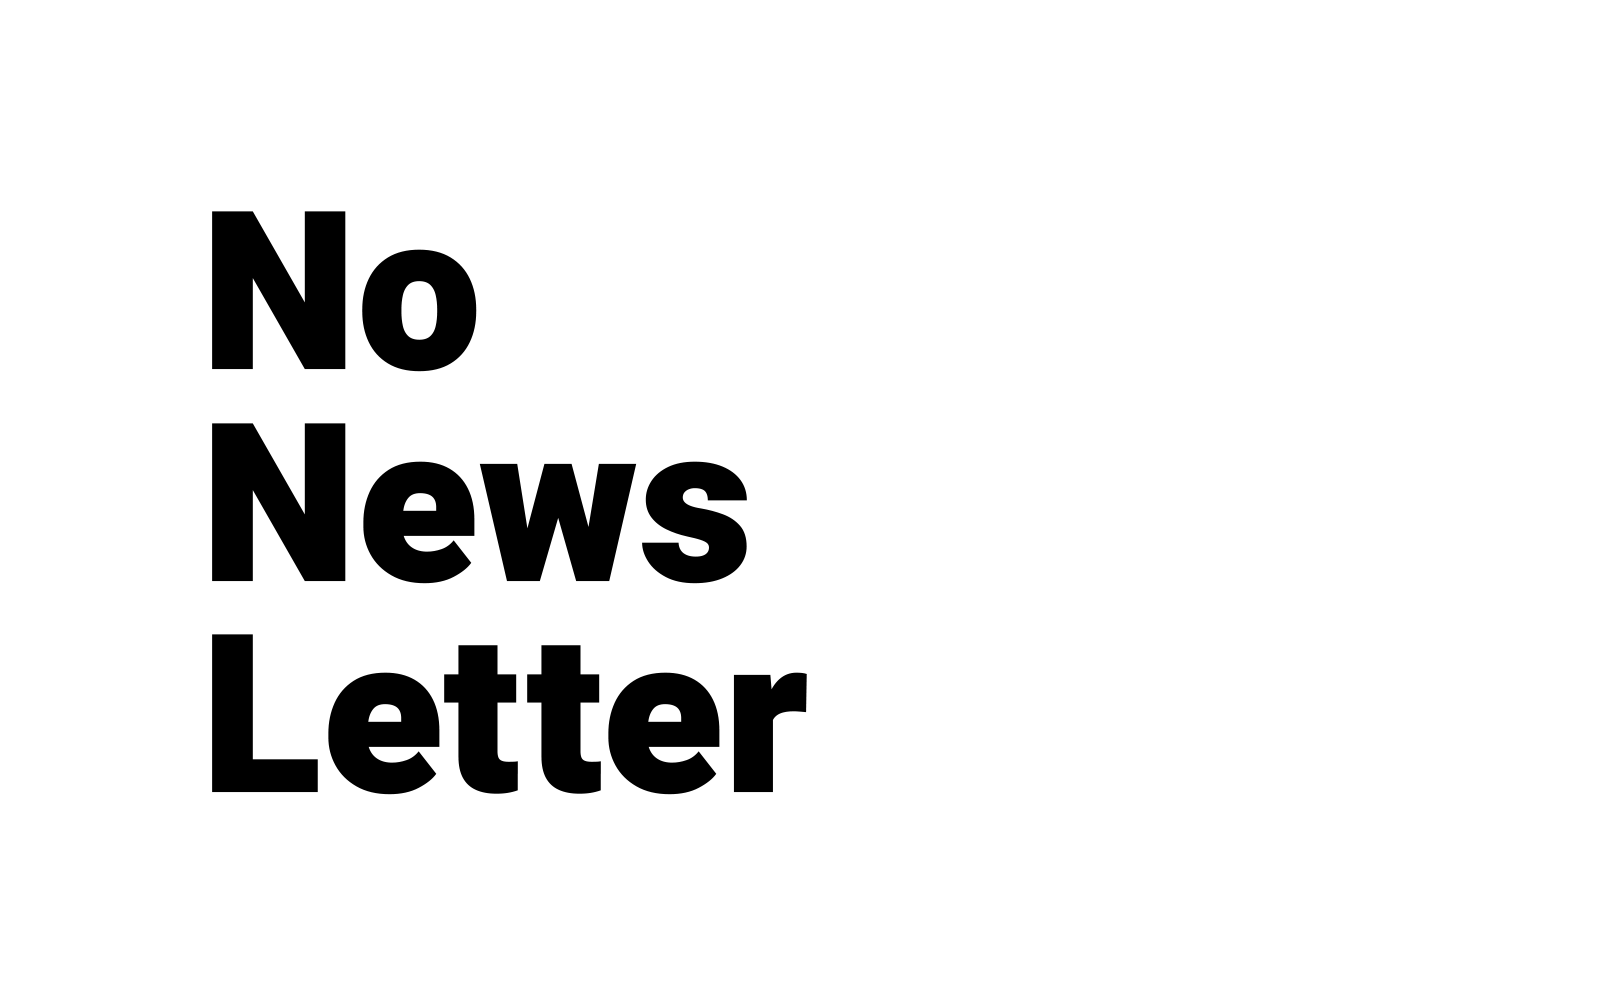 No News Letter